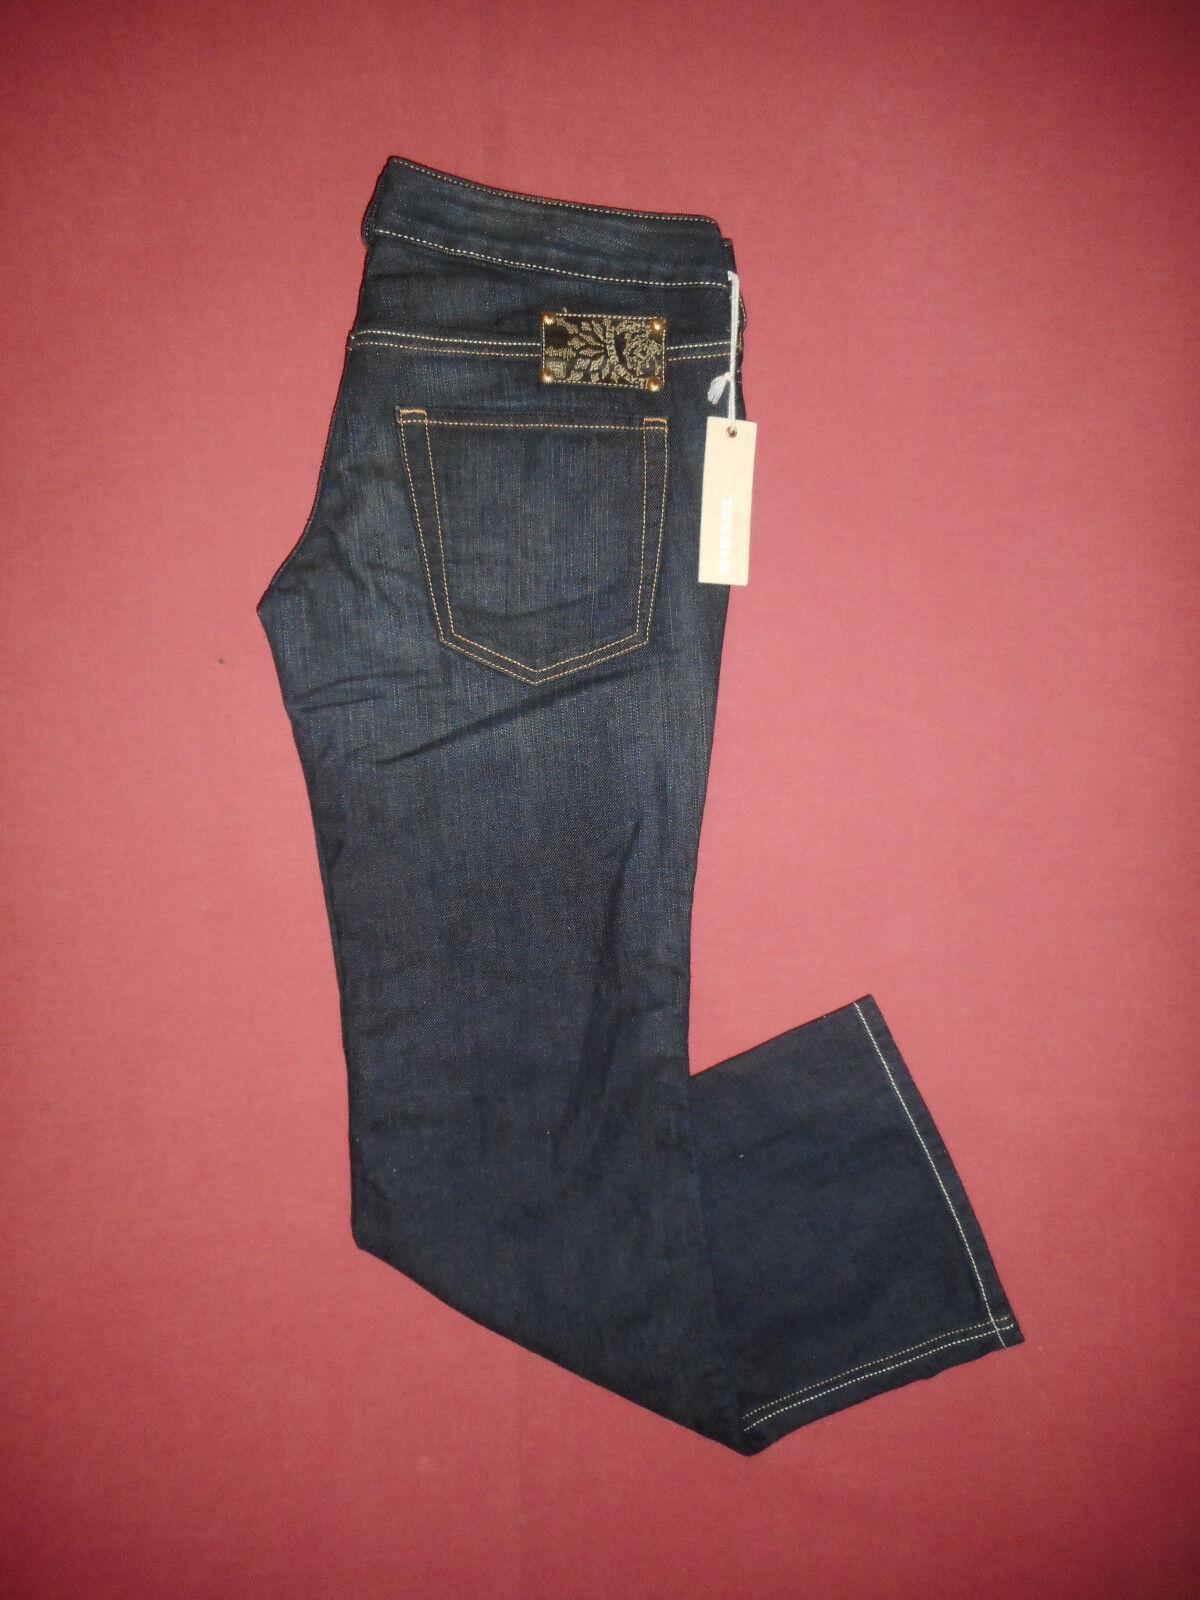 BNWT Diesel RYOTH 008AB - W29 L32 Bootcut - Ladies Womens bluee Denim Jeans